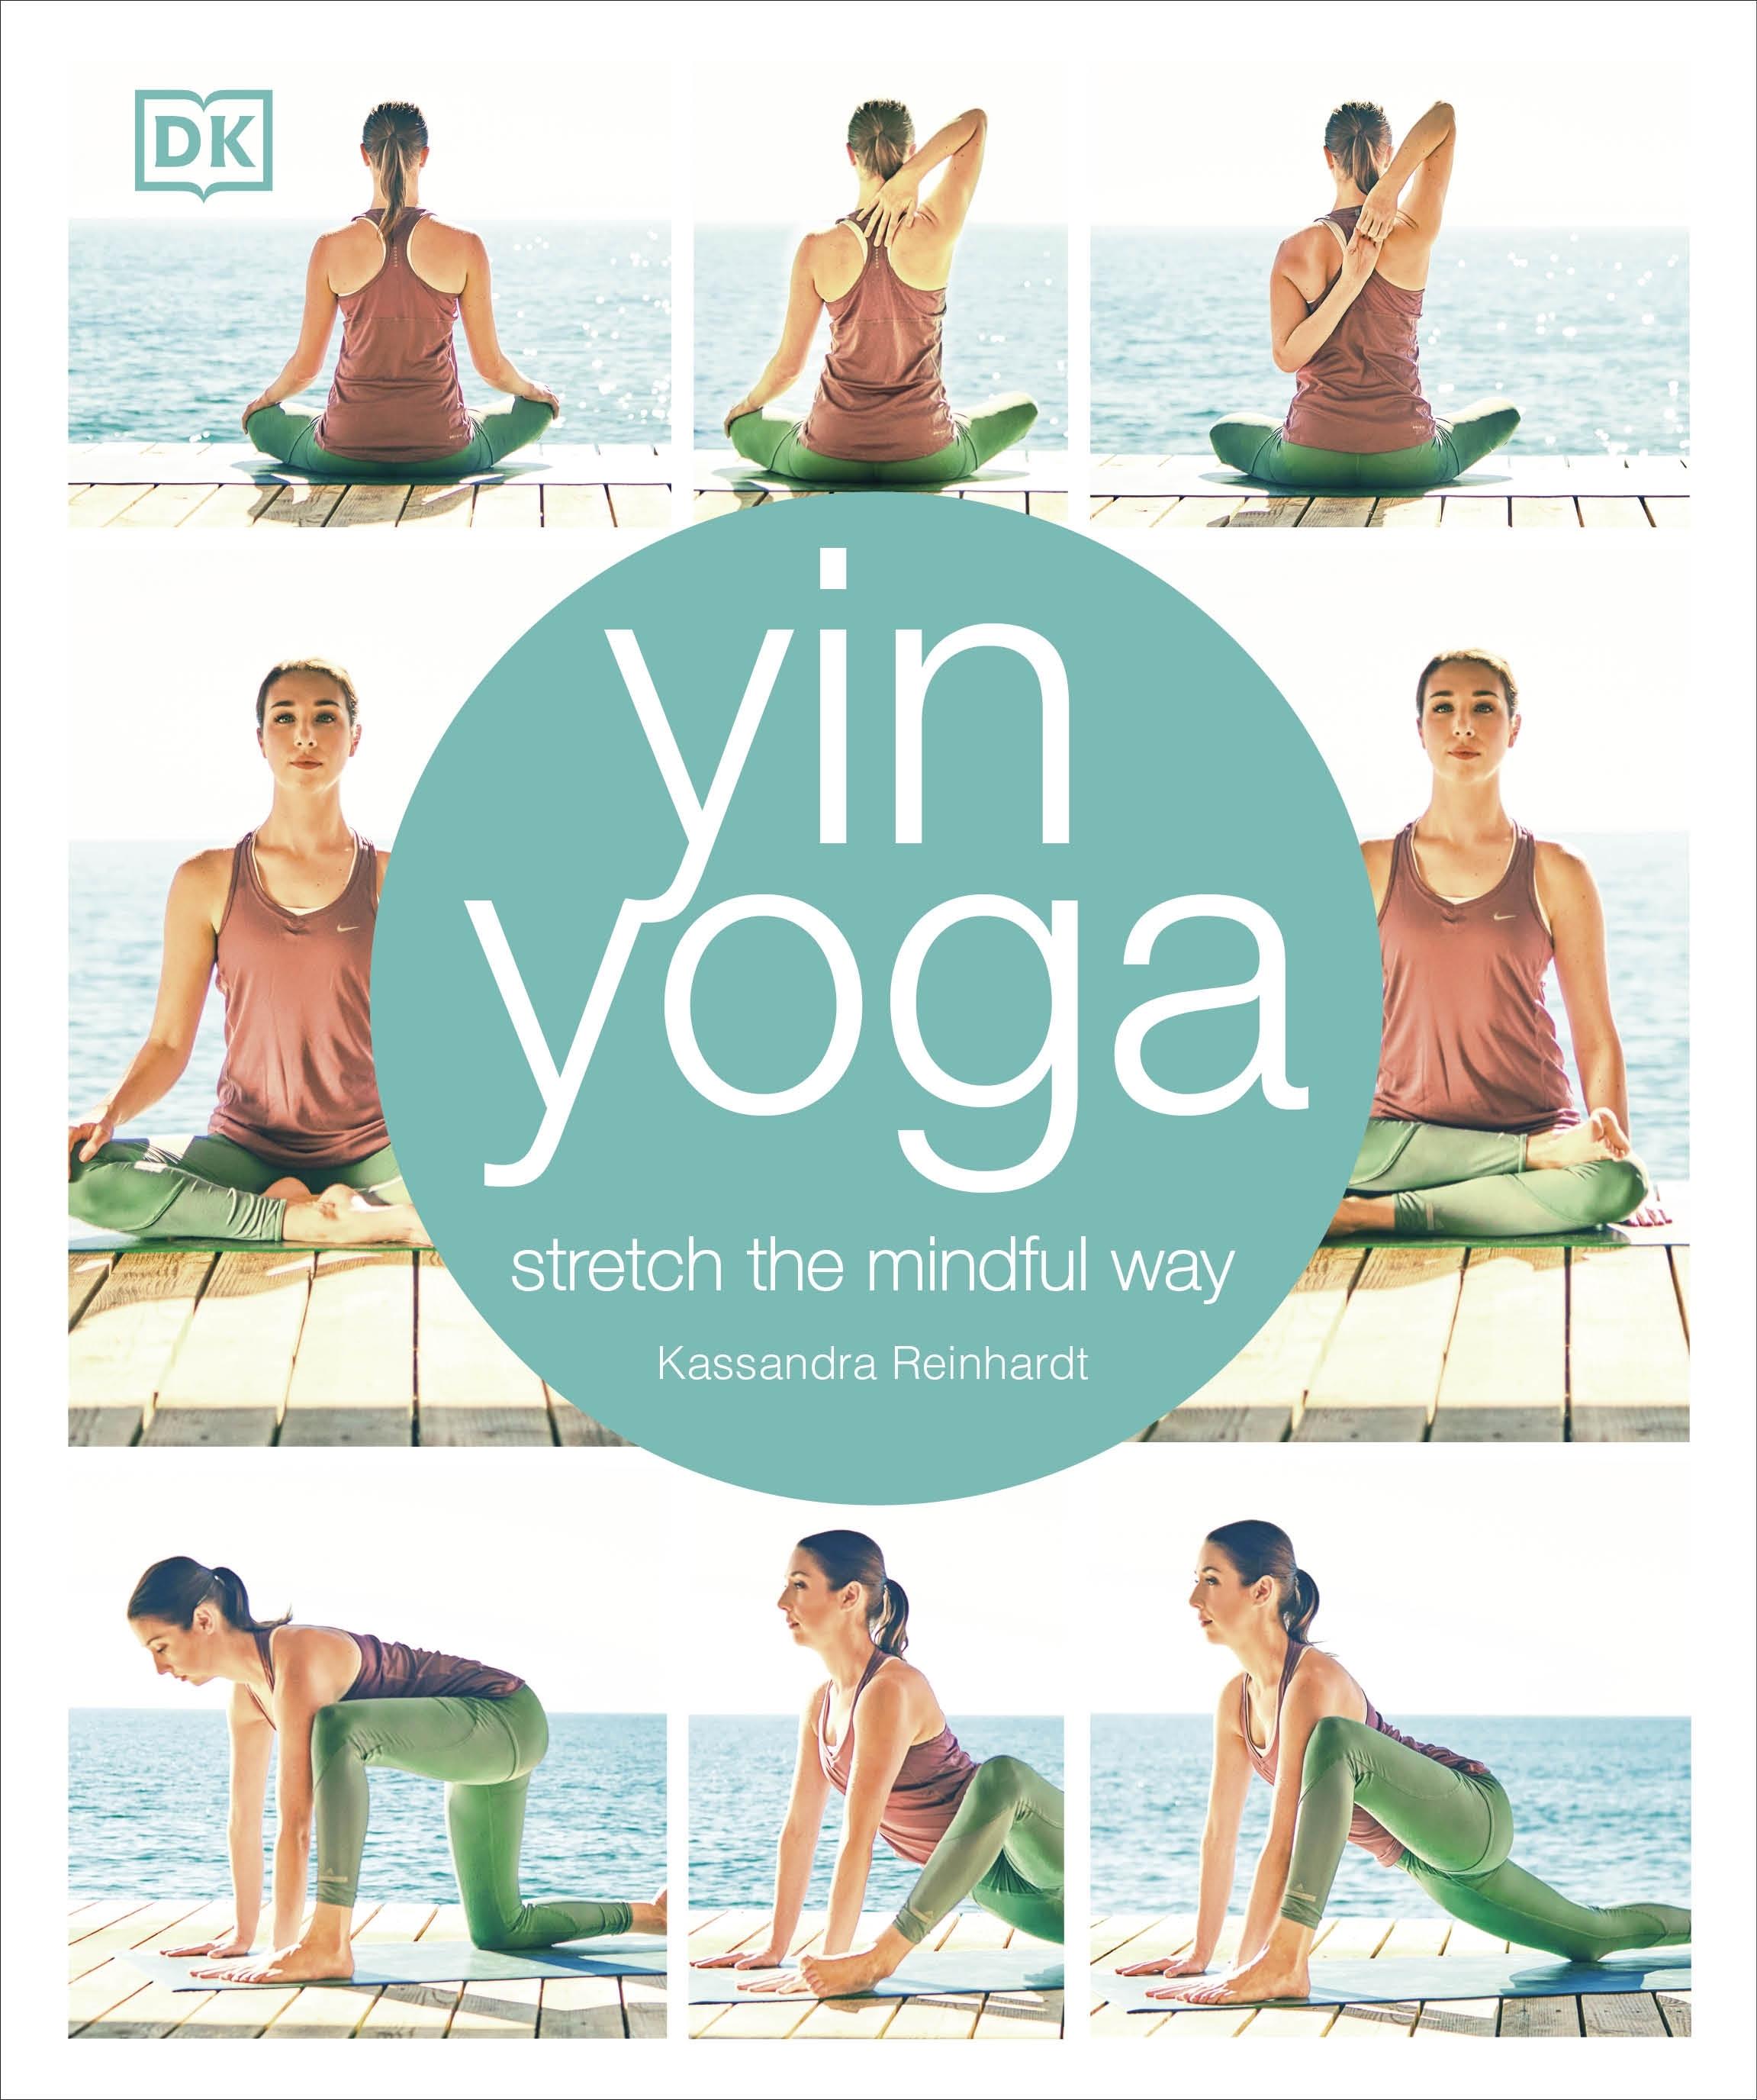 Fashion Book Cover Yoga : Yin yoga by dk penguin books australia